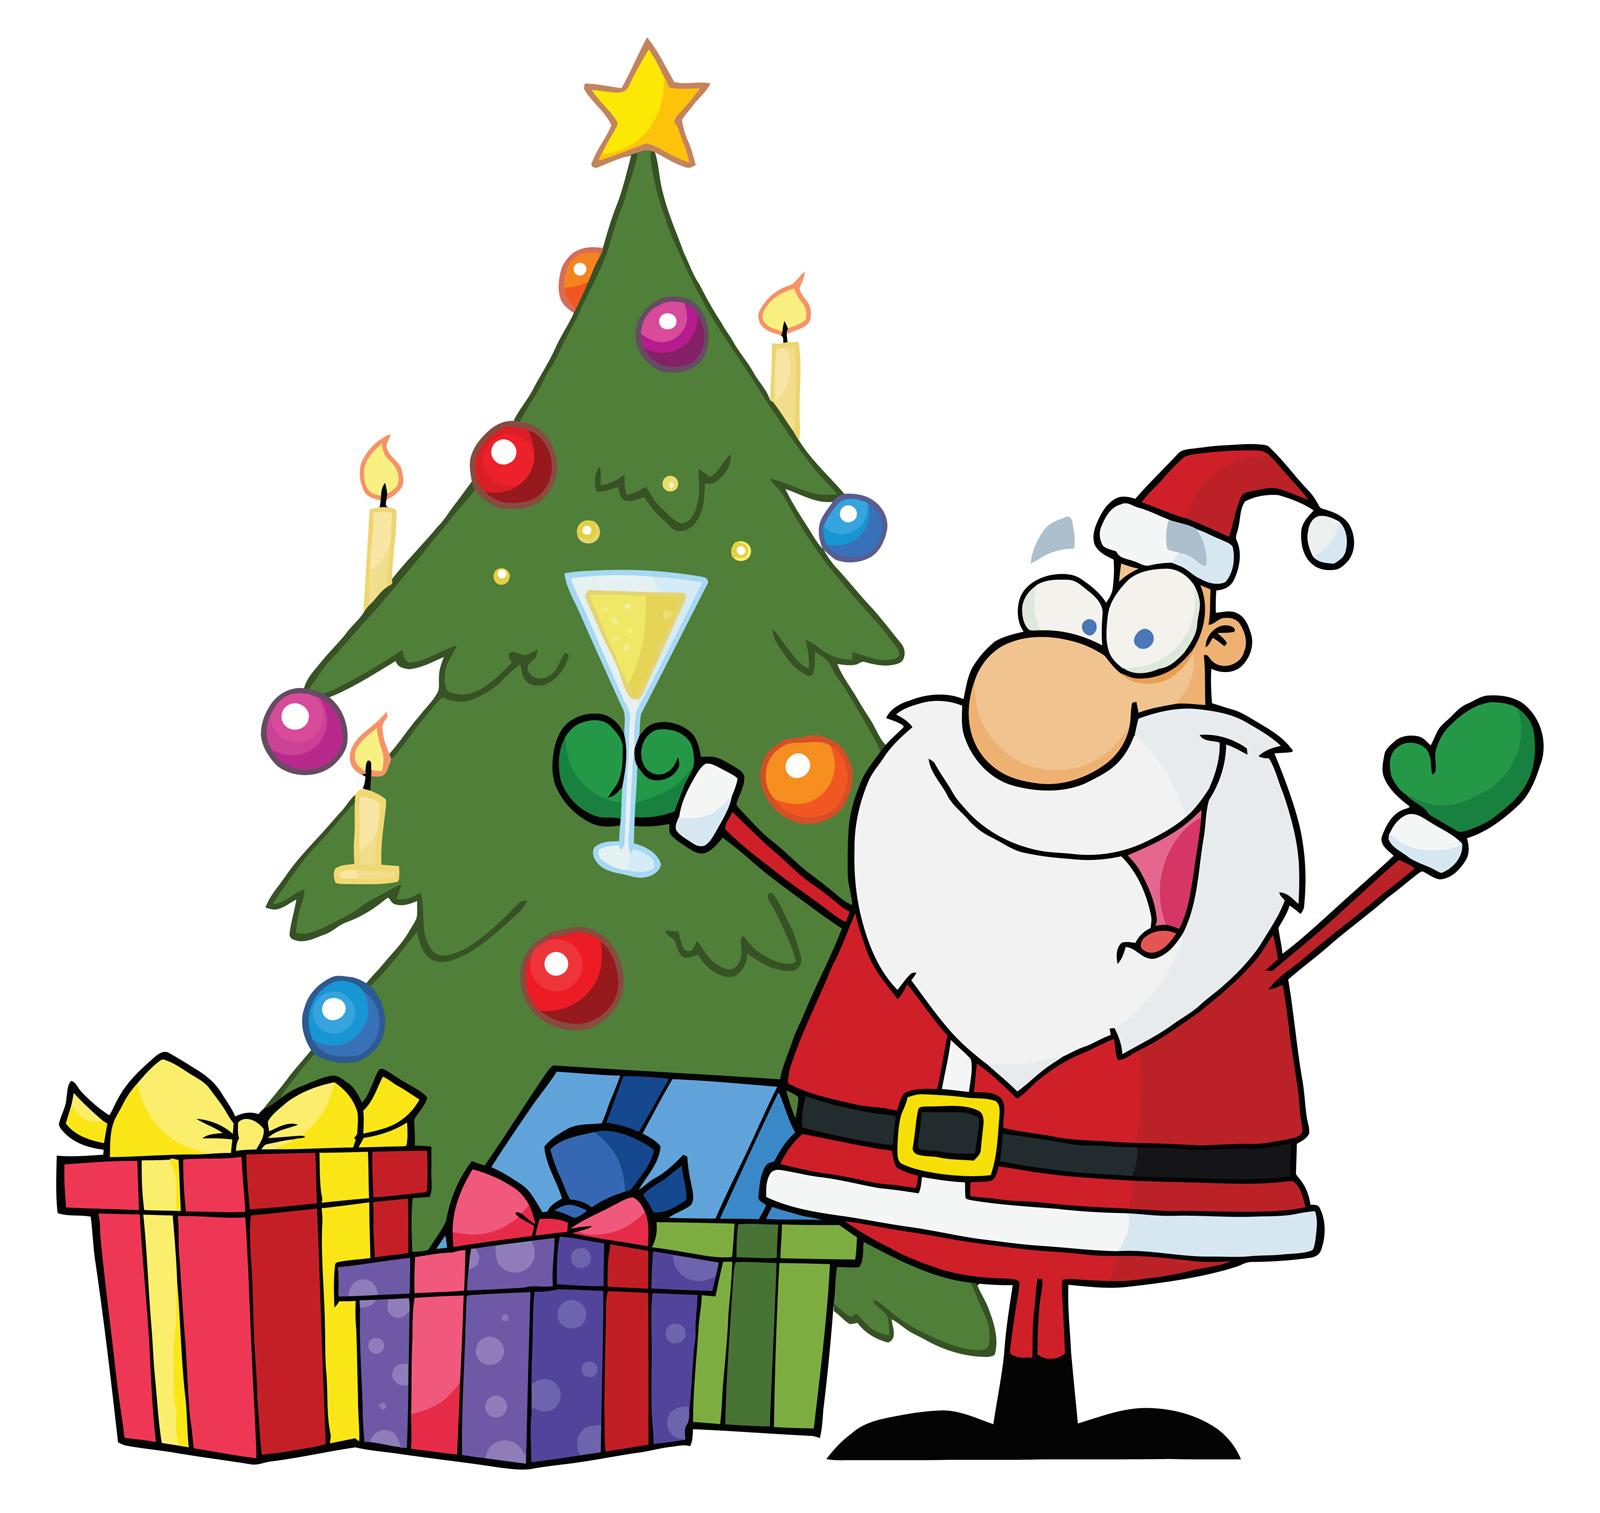 superhero christmas clipart at getdrawings com free for personal rh getdrawings com christmas clipart free christmas clipart public domain